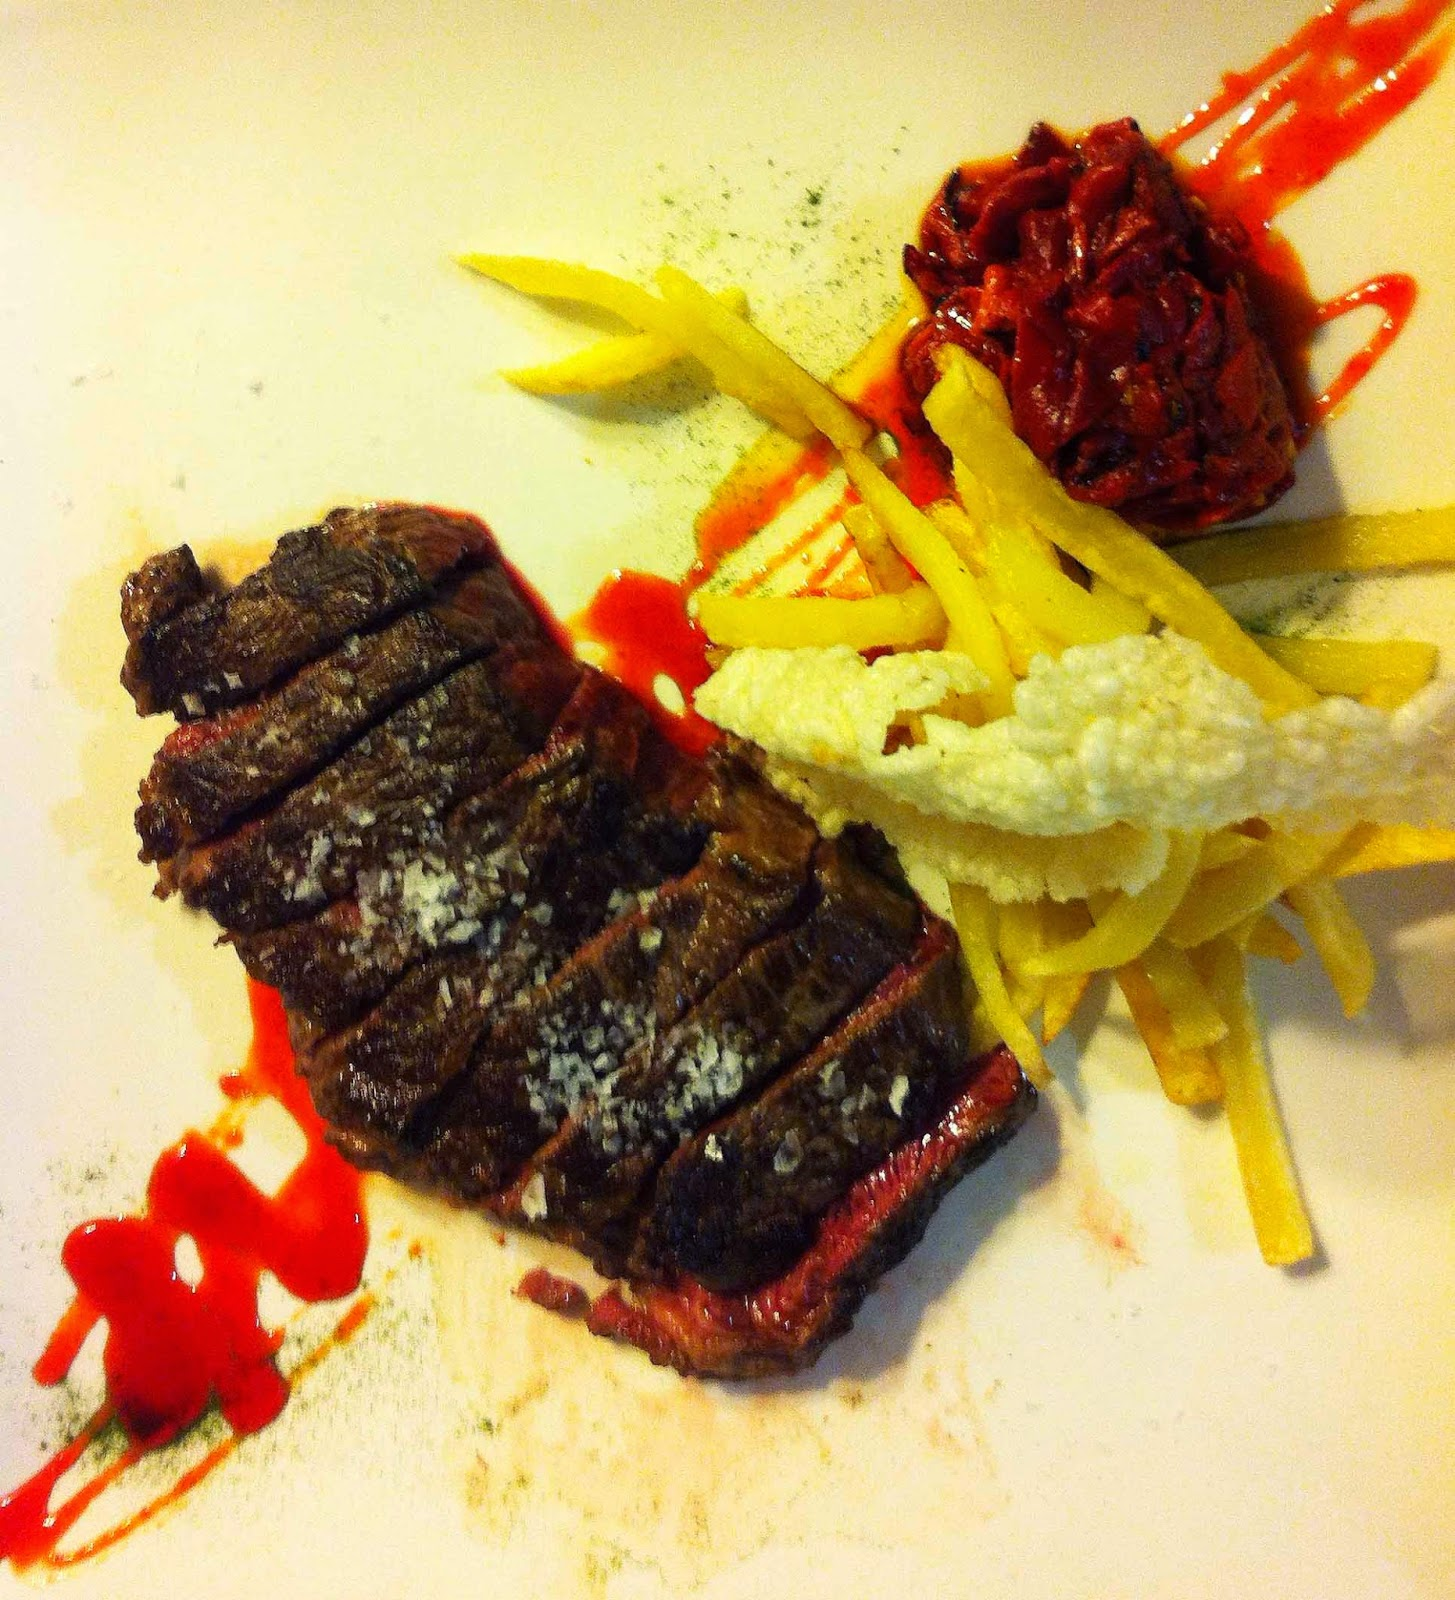 Restaurante-Farketa56-Bilbao-Entrecot